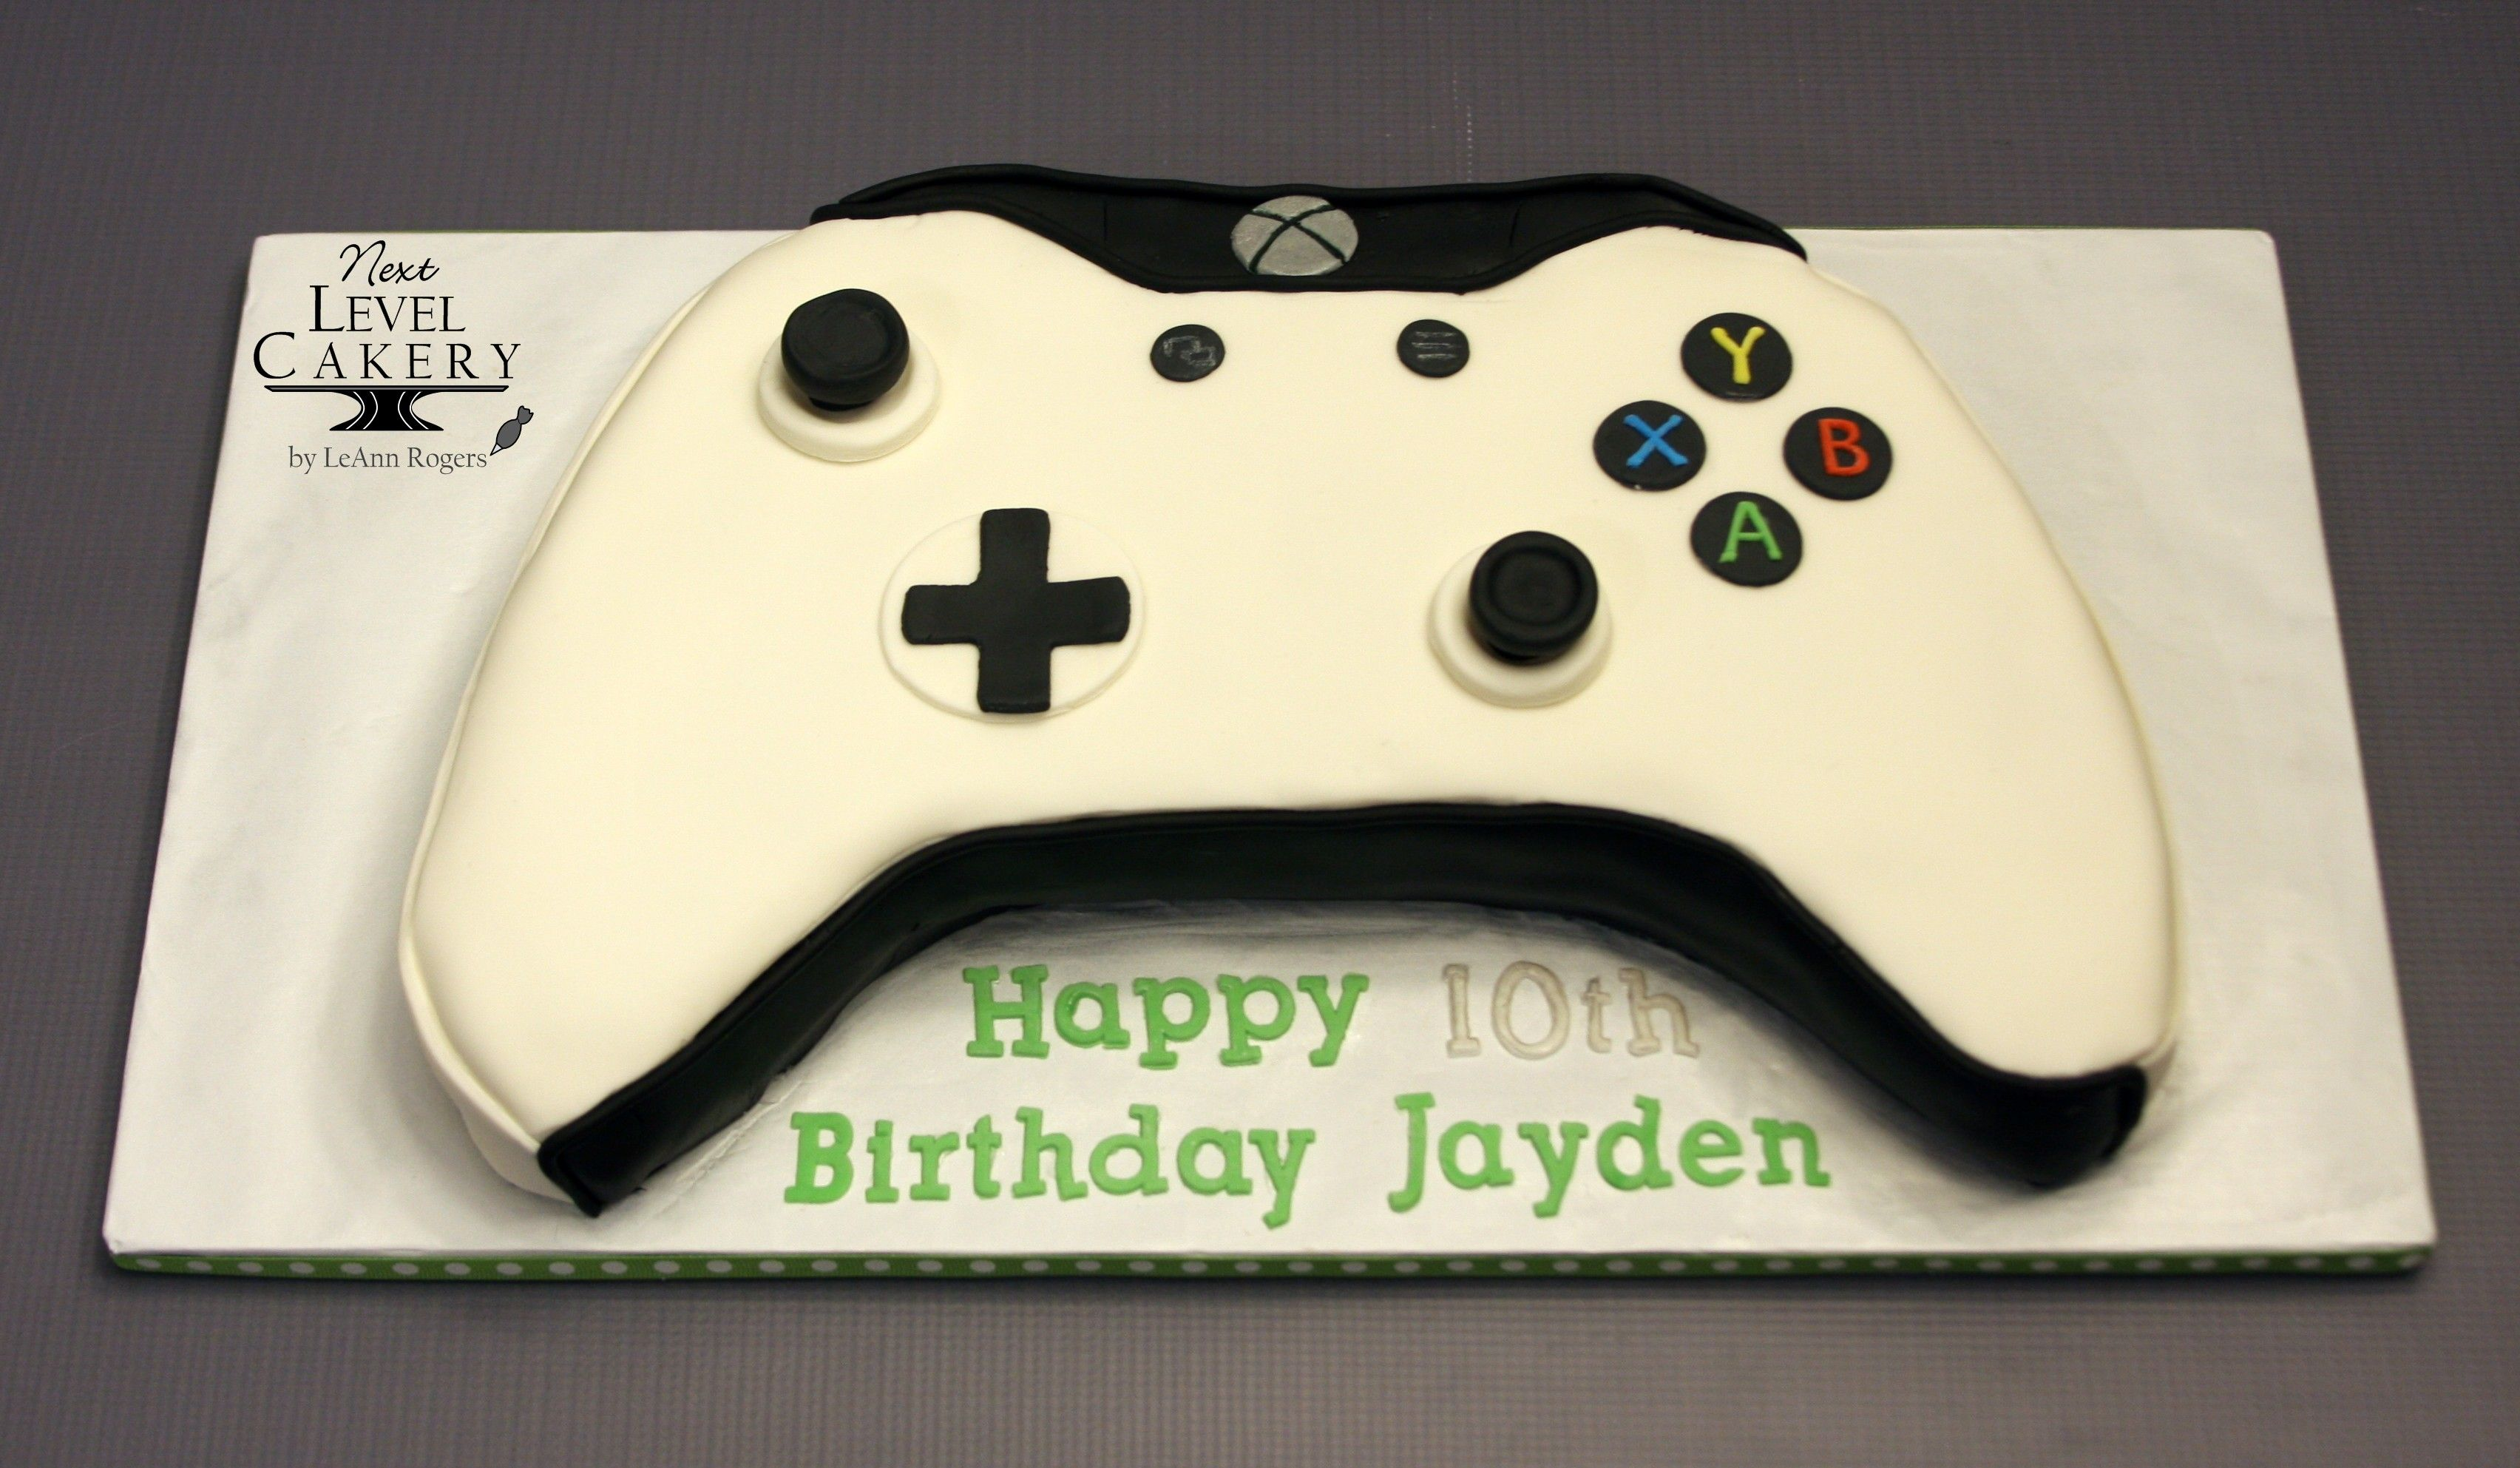 xbox controller cake | Next Level Cakery cakes | Pinterest | Xbox ...